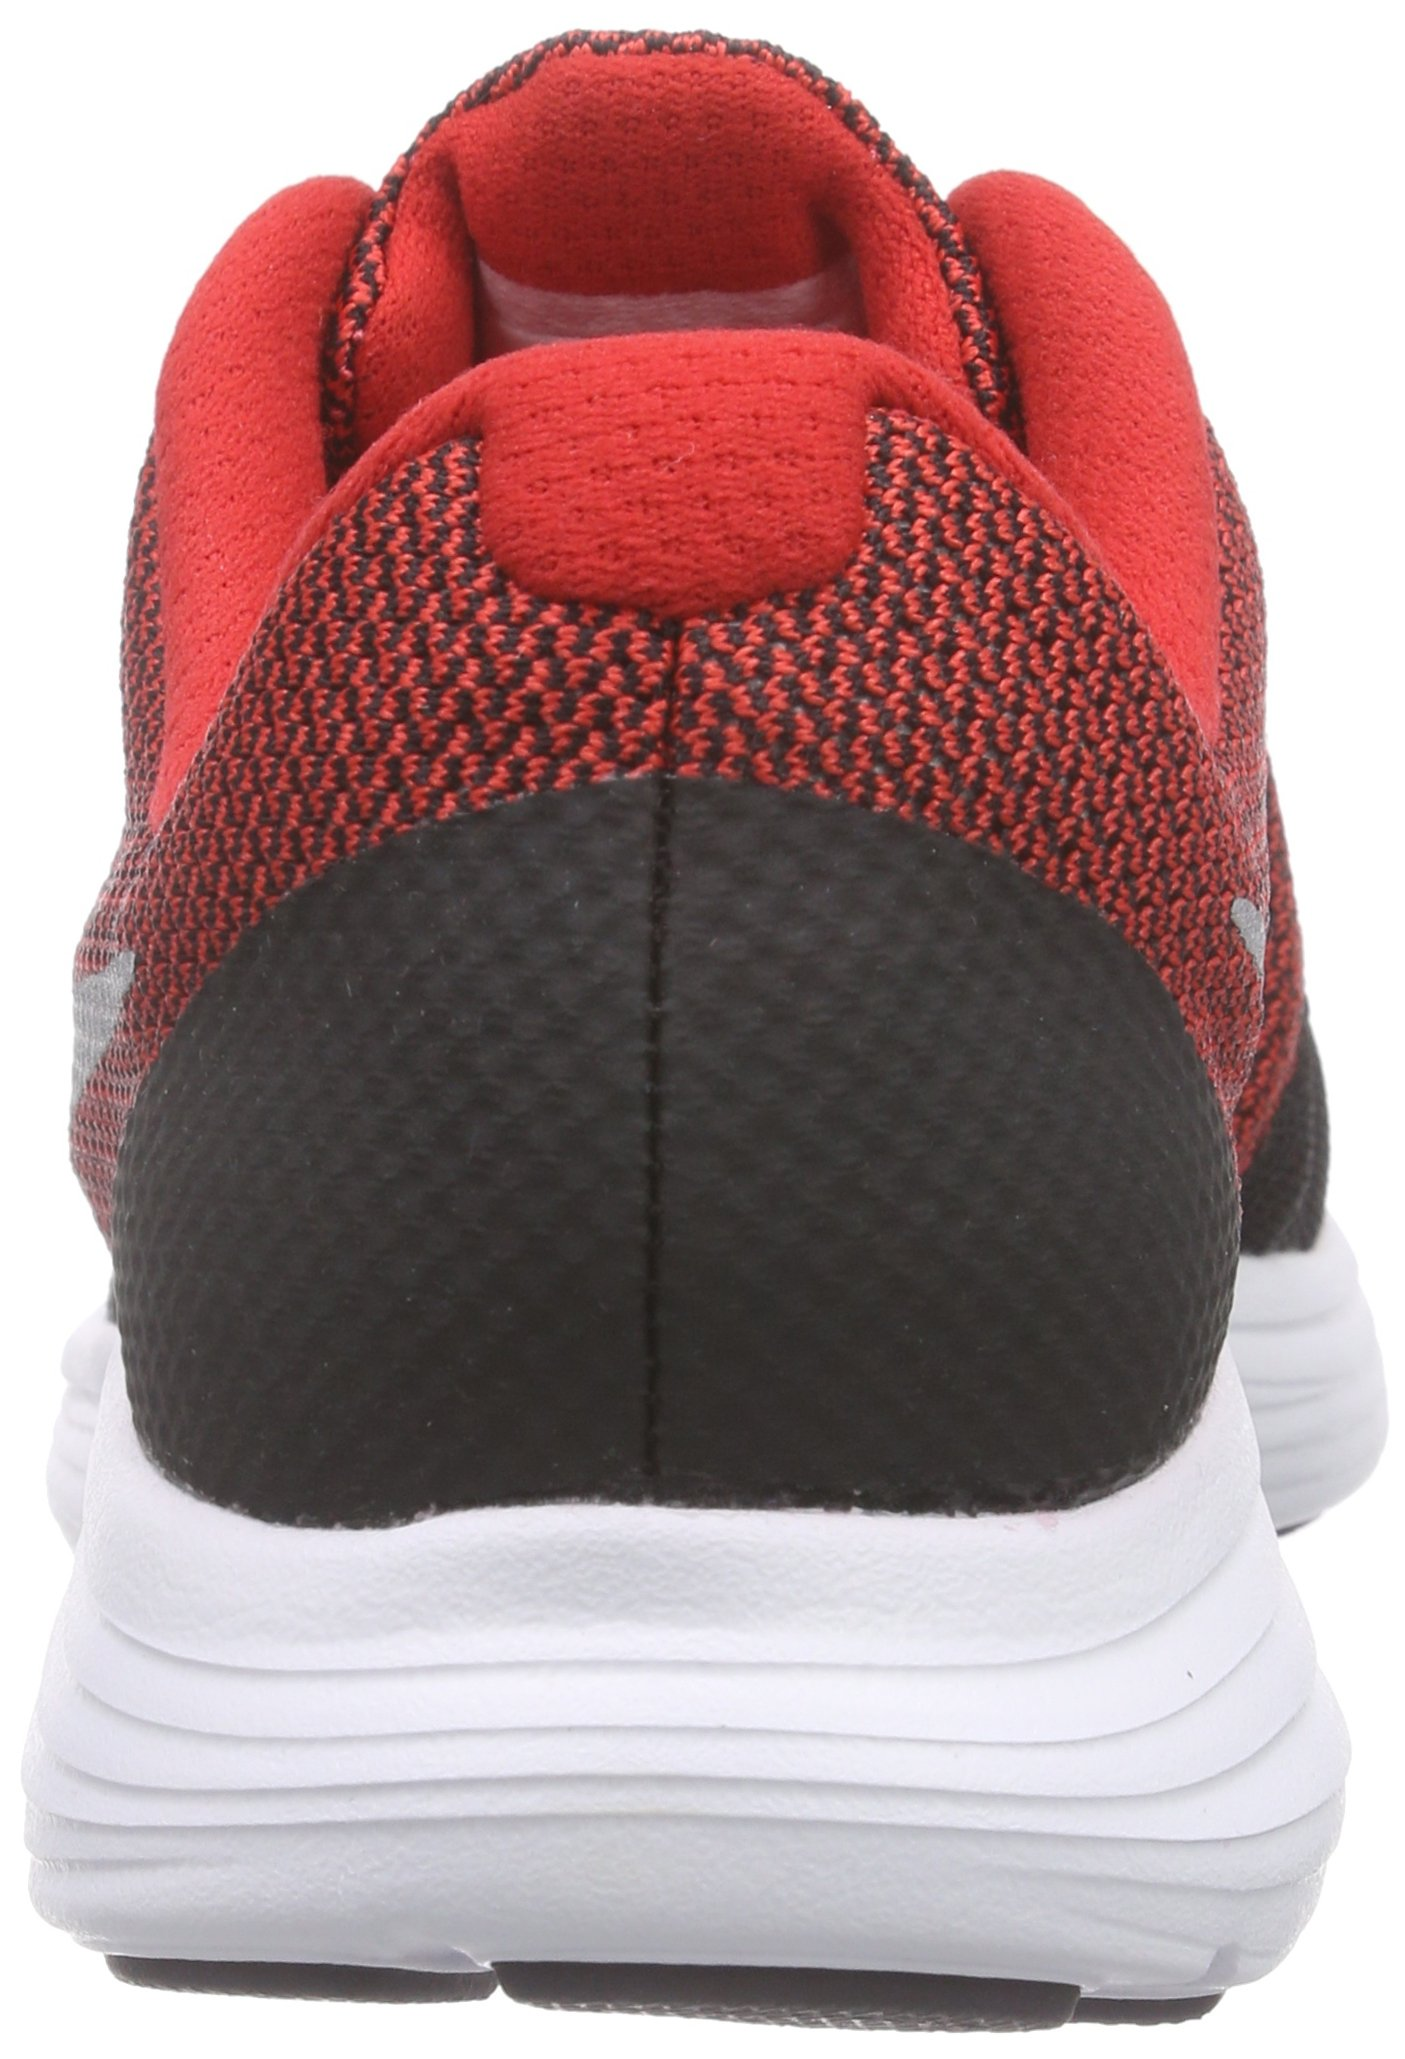 NIKE Boys' Revolution 3 Running Shoe (GS), University Red/Metallic Silver/Black, 4 M US Big Kid by Nike (Image #2)